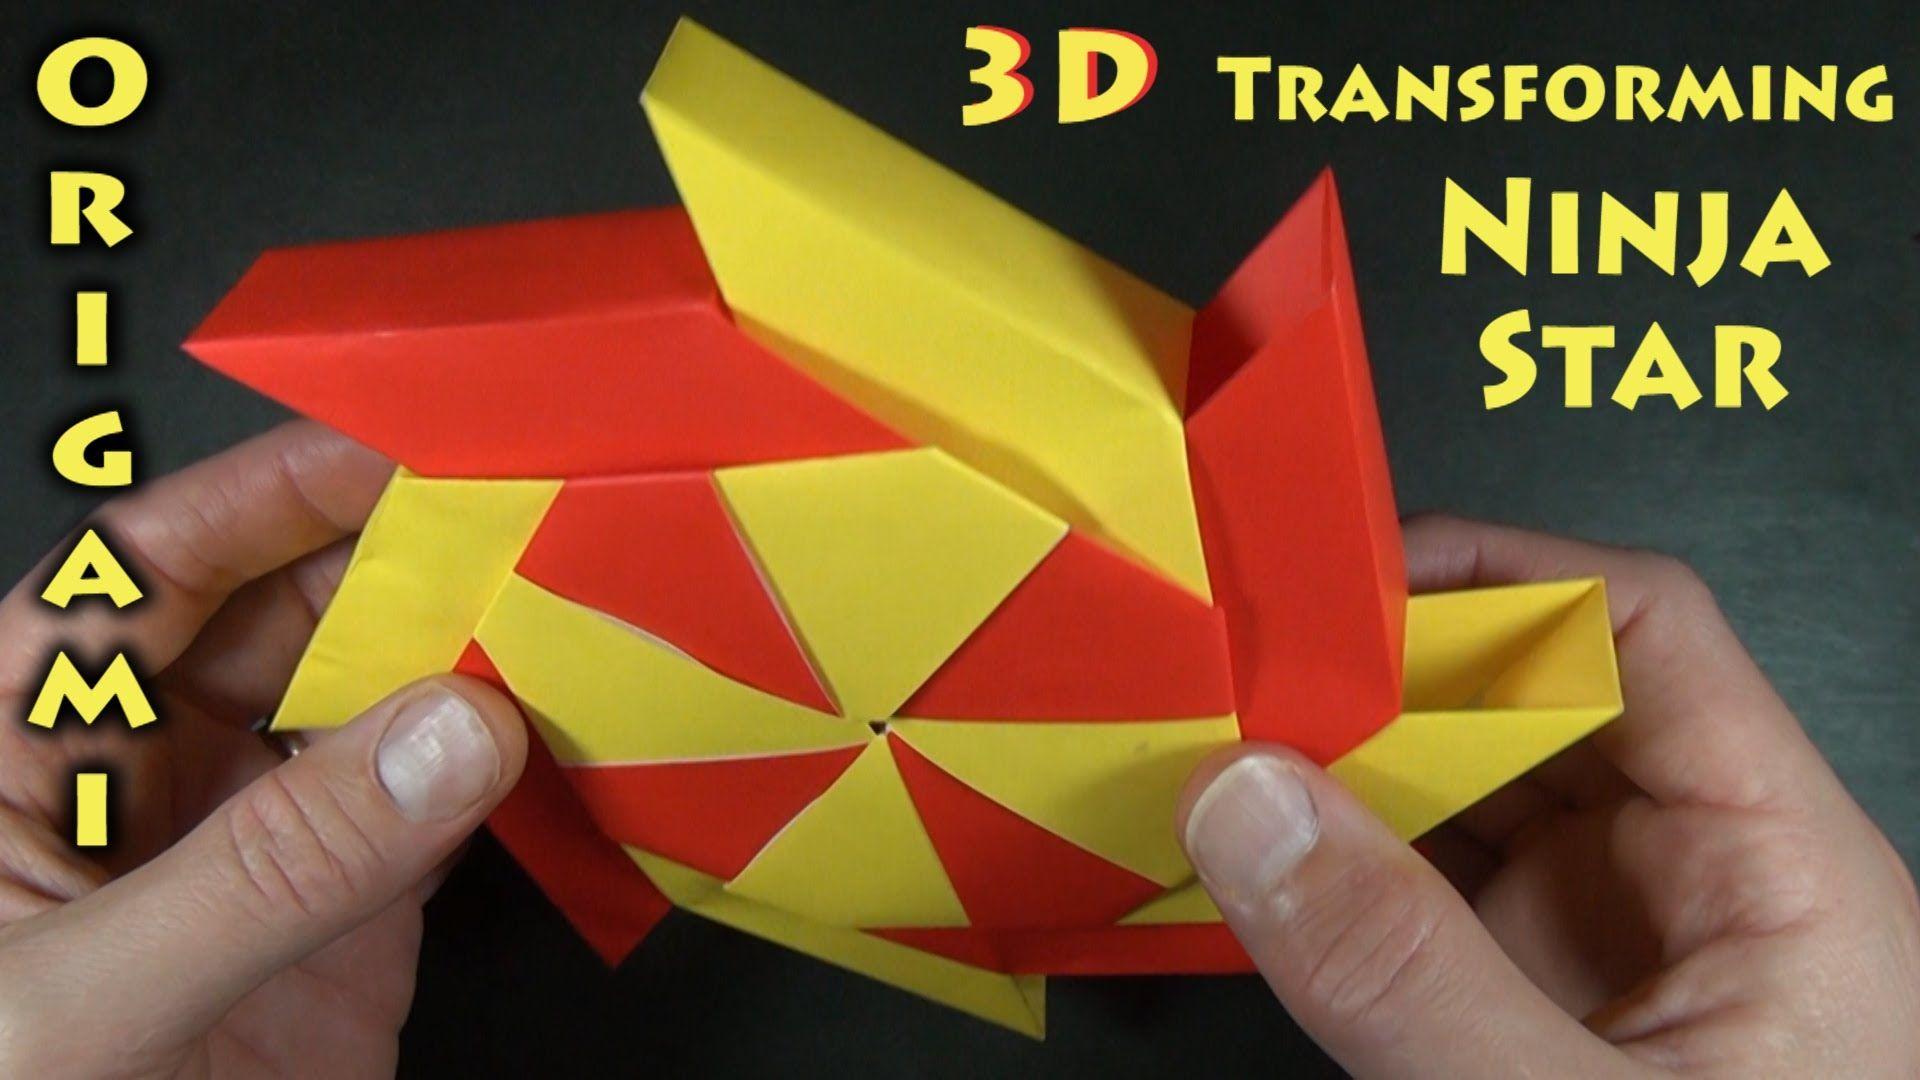 Contact us at Origami-Instructions.com | 1080x1920